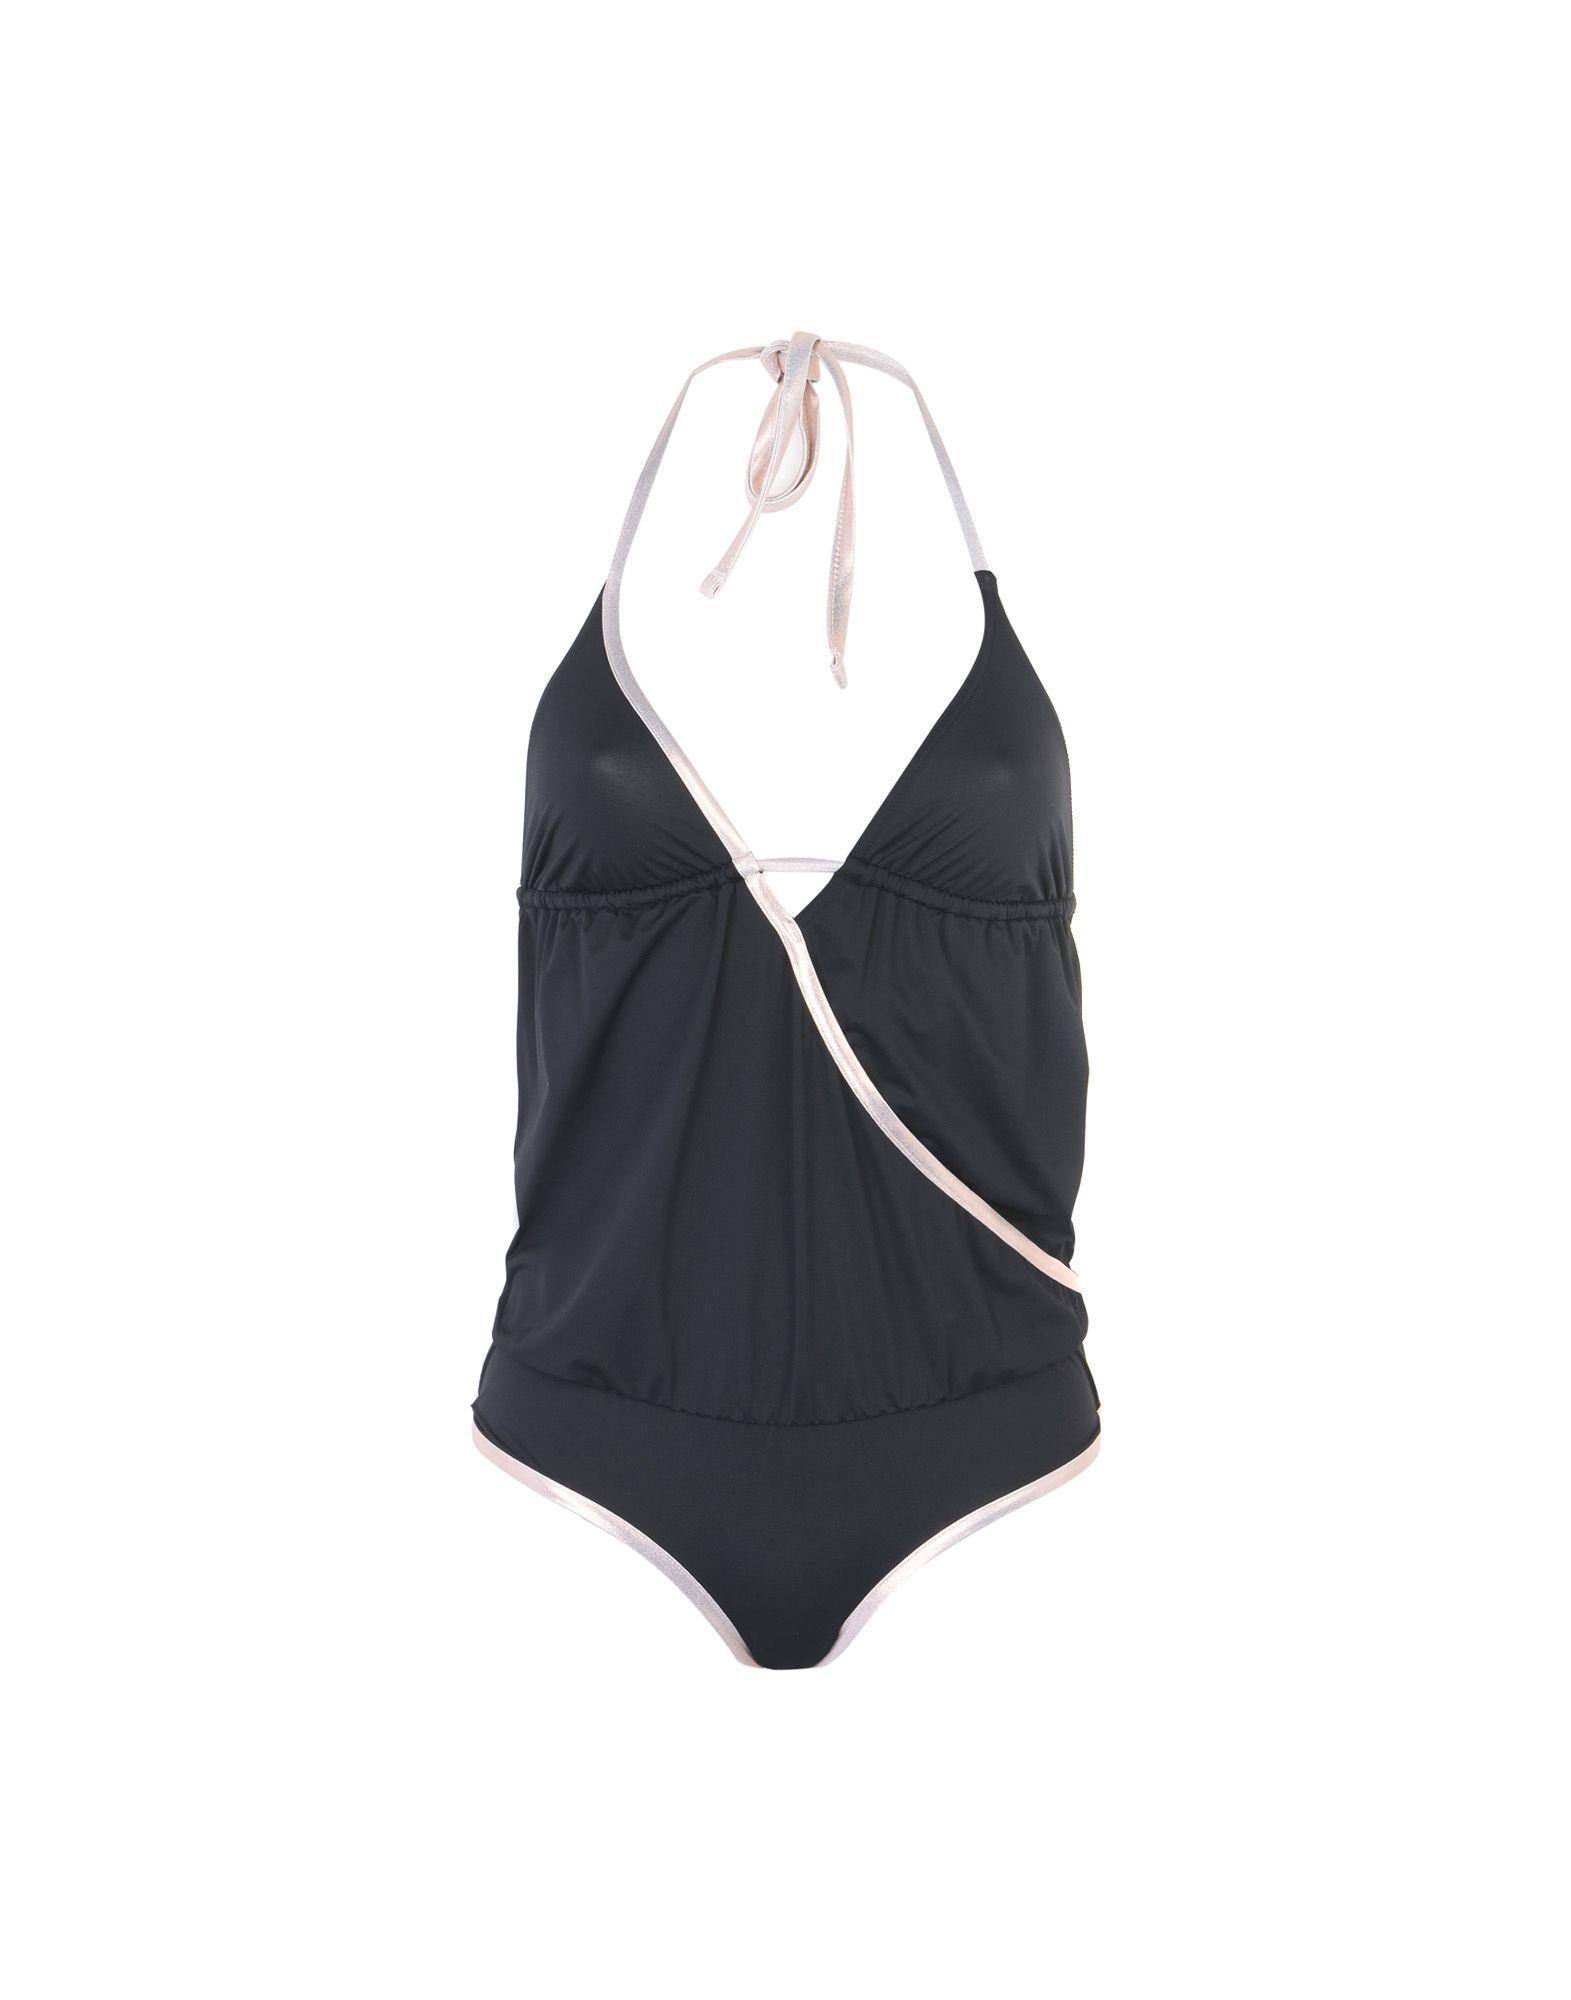 ALBERTINE One-Piece Swimsuits in Black